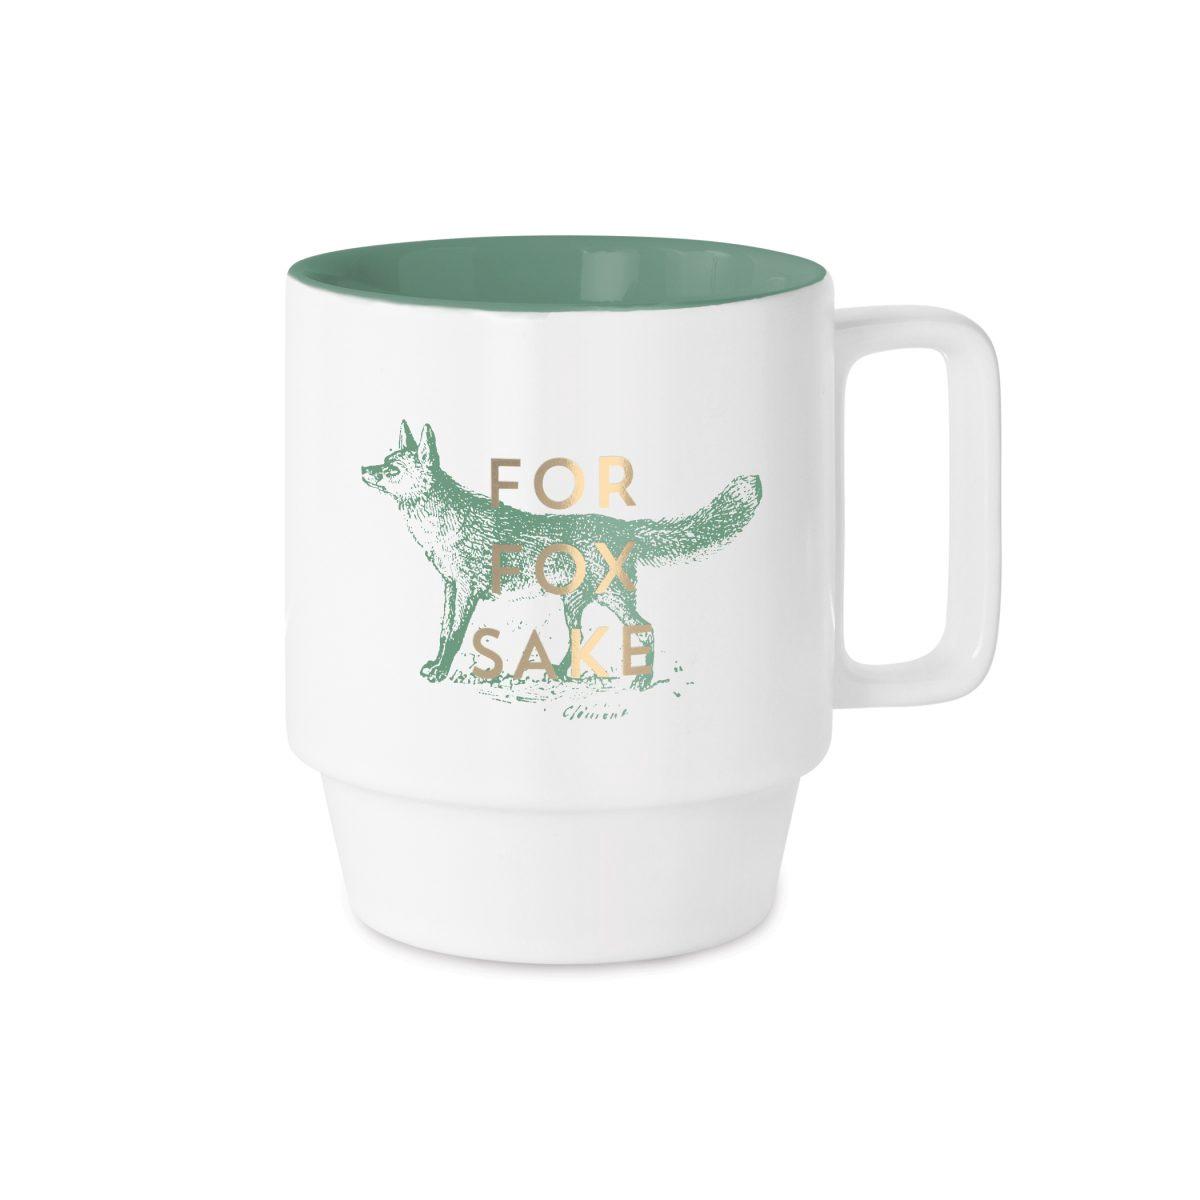 Vintage Sass Mugs